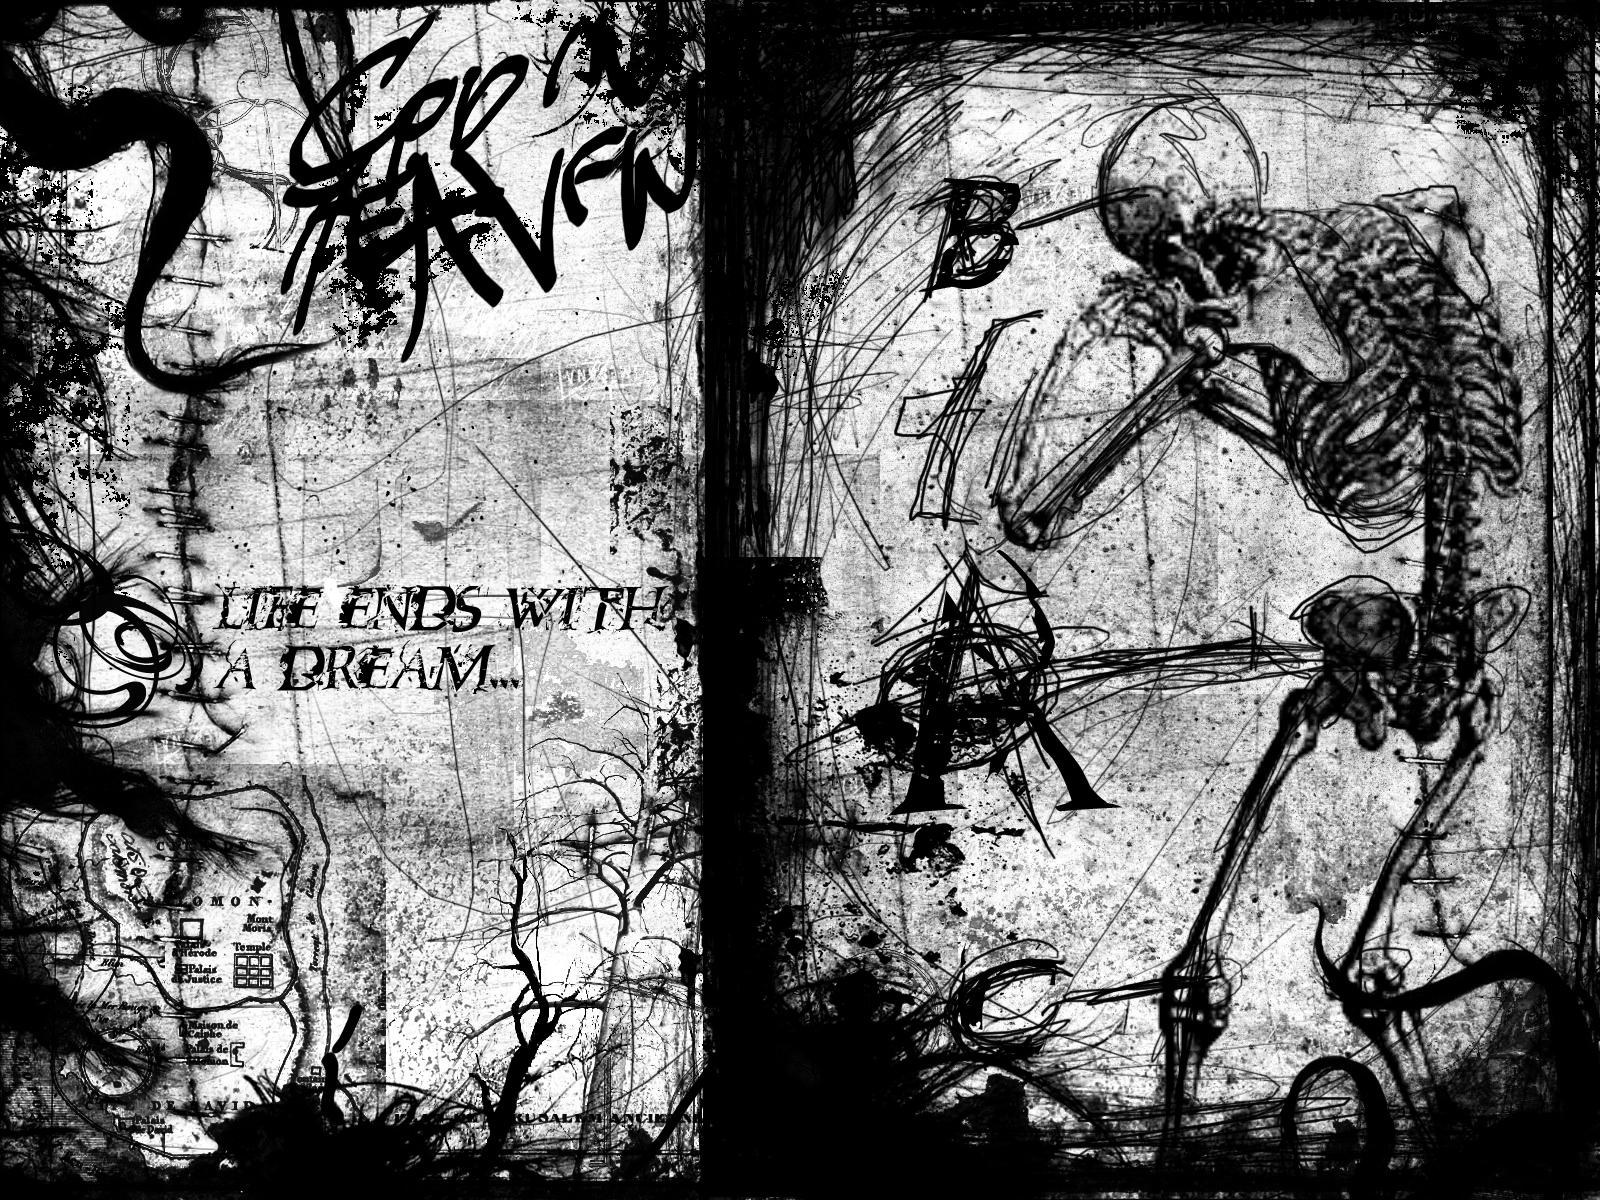 gothic wallpaper   Gothic Wallpaper 4850547 1600x1200